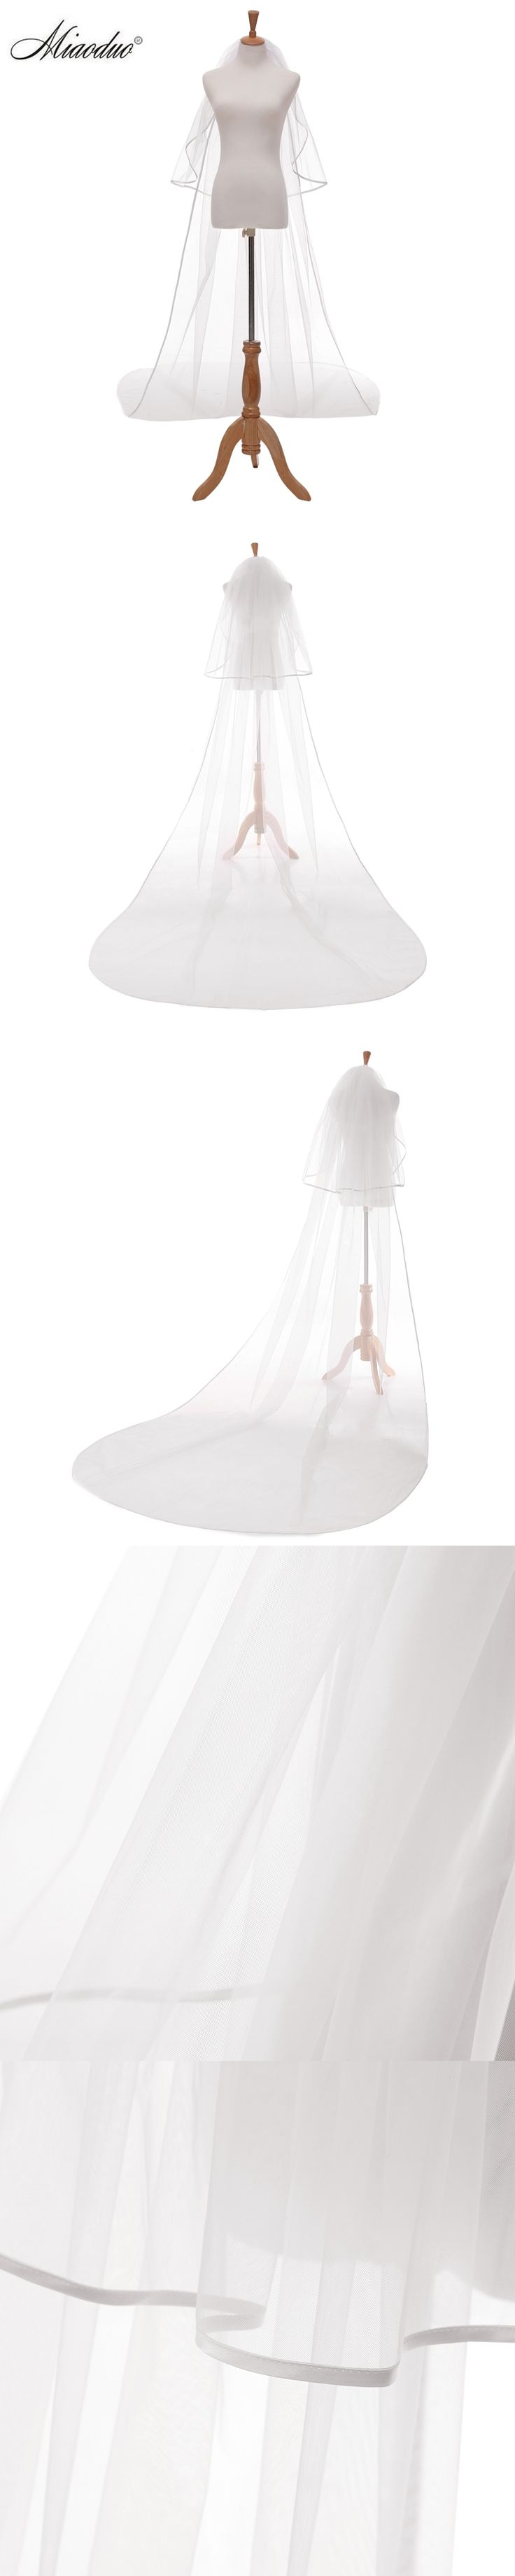 Miaoduo 2018 Nice Cut Edge Simple Cheap Wedding White Veil Wedding Accessories Velos De Novia voile de mariee